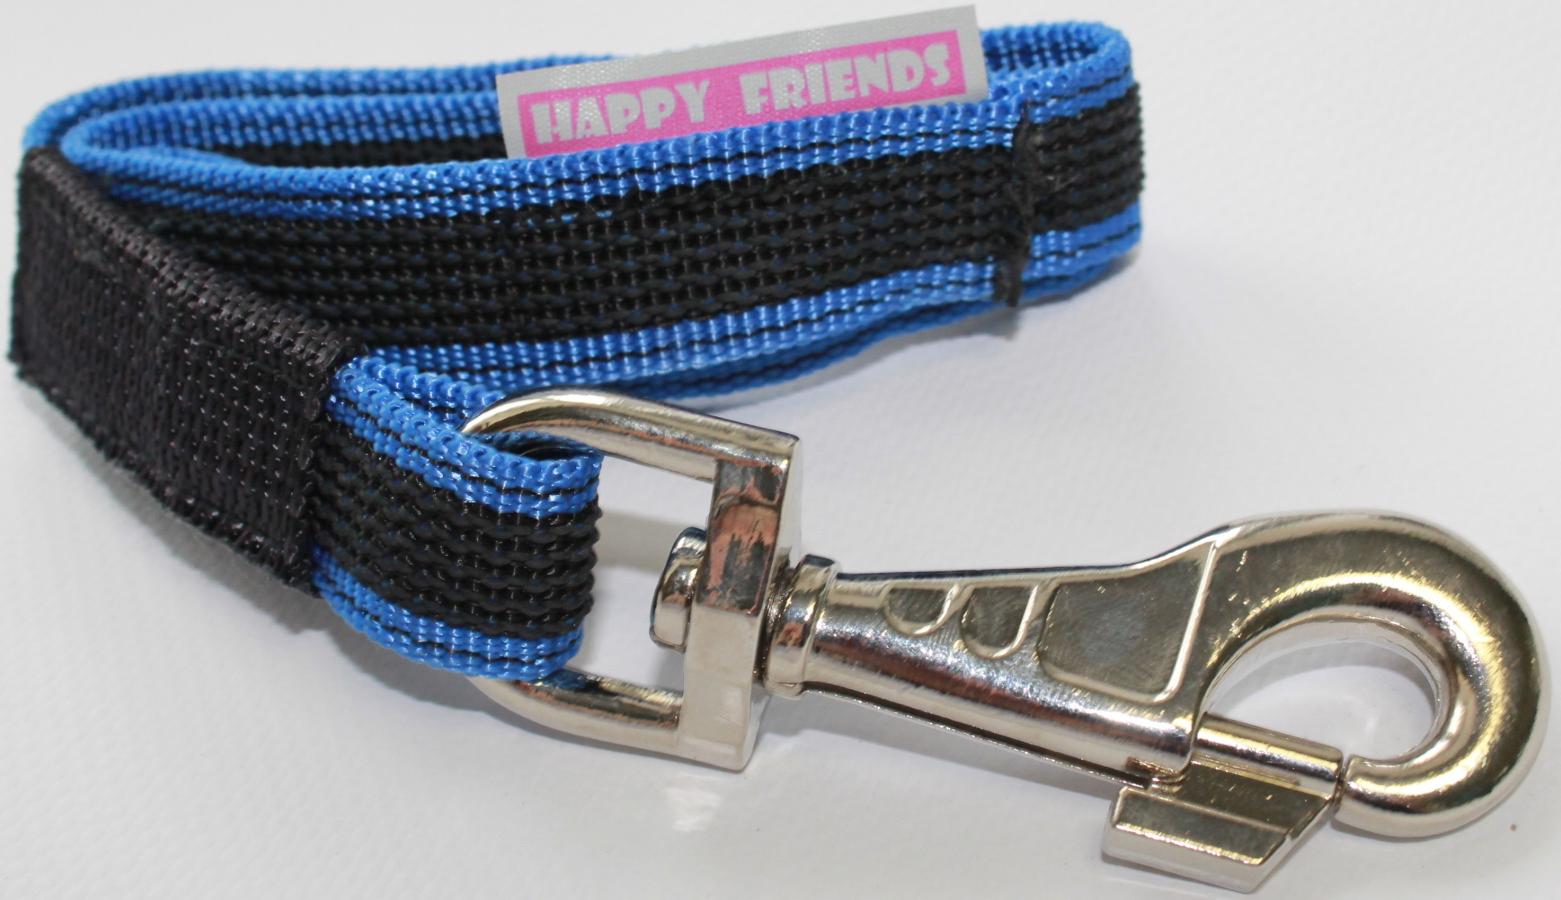 Поводок-водилка Happy Friends, плавающий, нескользящий, цвет: синий, ширина 2,5 см, длина 0,40 м поводок водилка для собак happy friends нескользящий цвет синий ширина 2 см длина 0 40 м